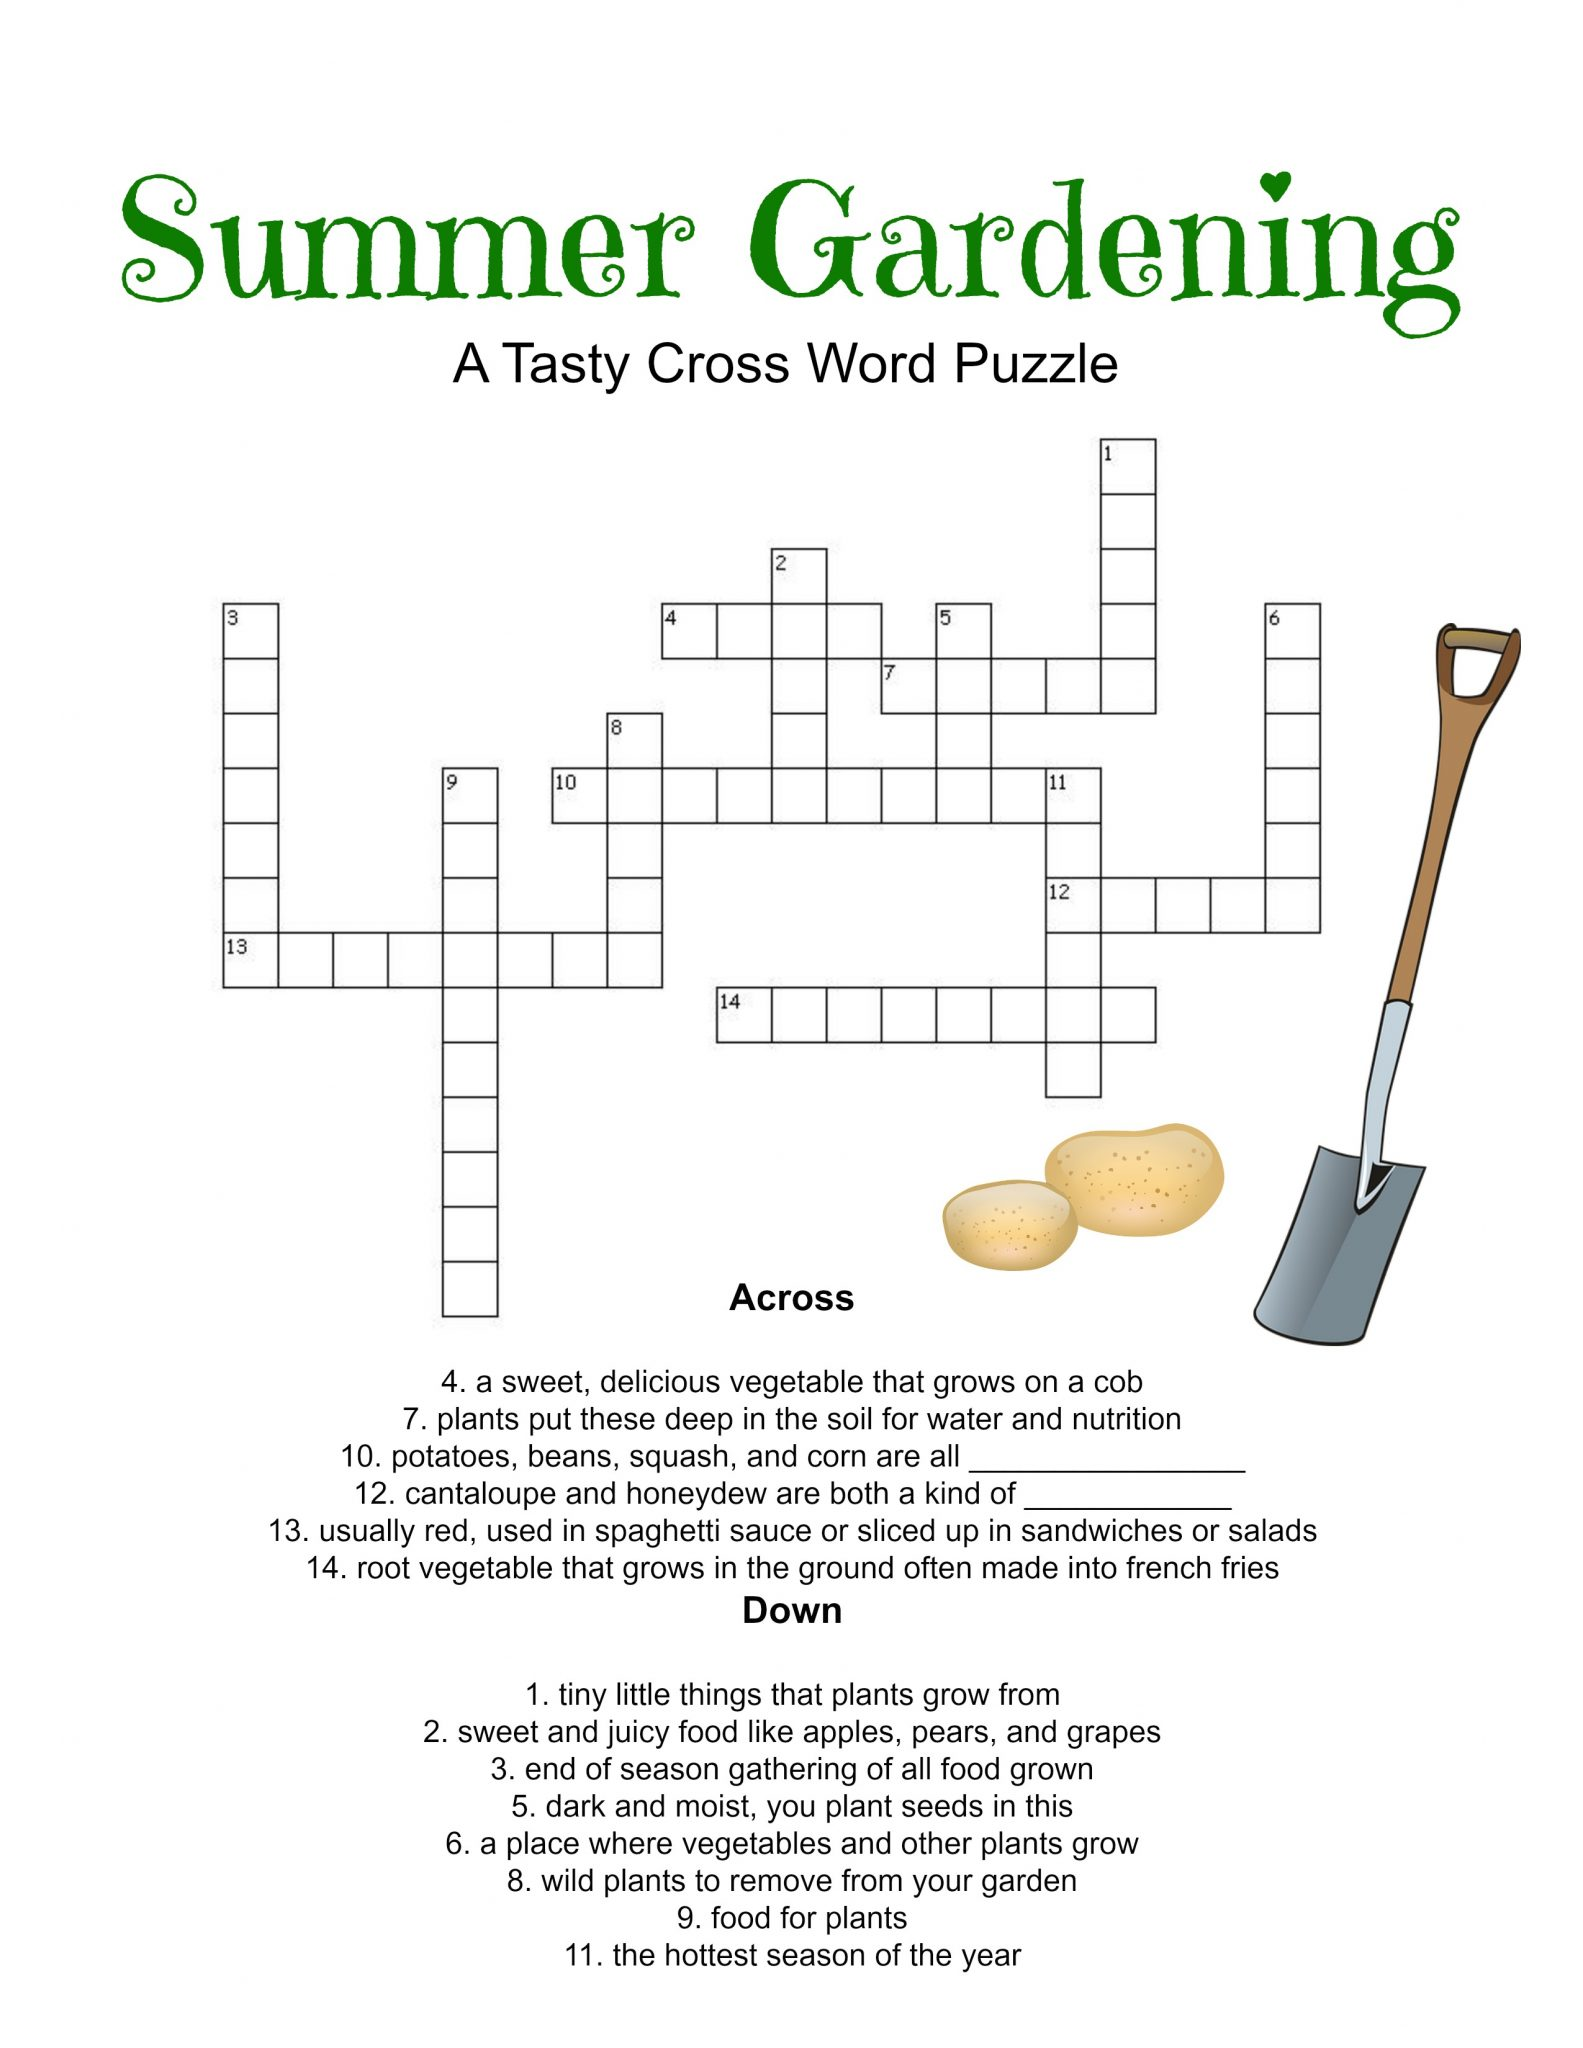 Summer Gardening Printable Game Set for Kids! #Printables